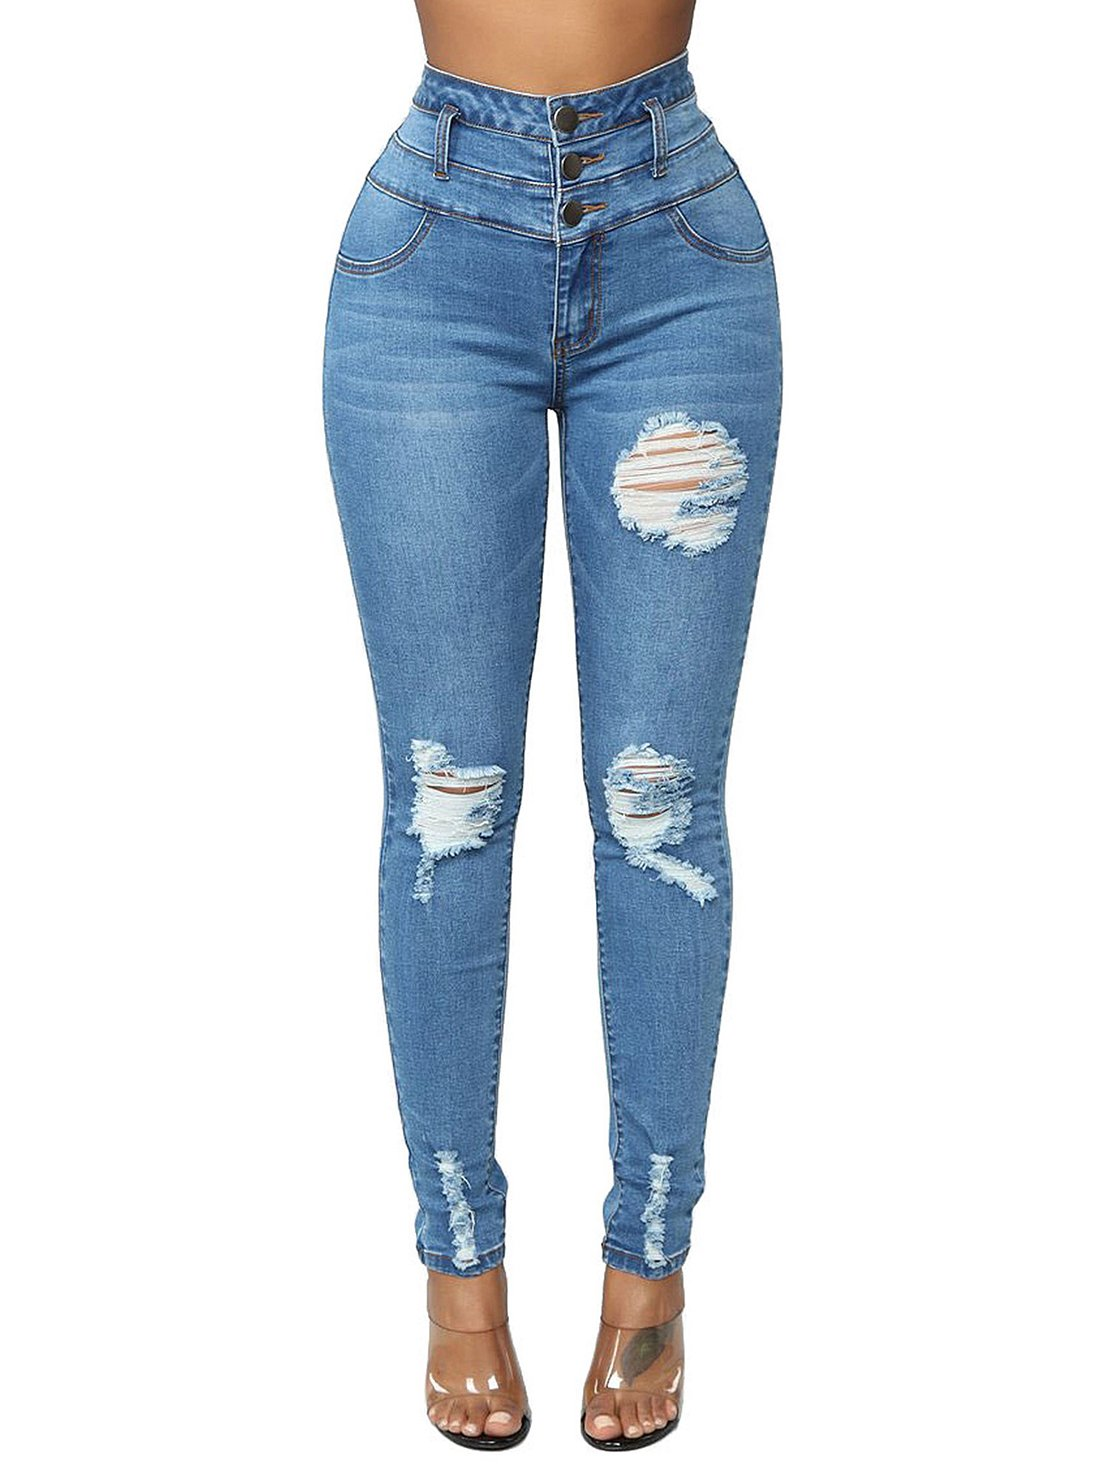 Ripped Denim Jeans Pants